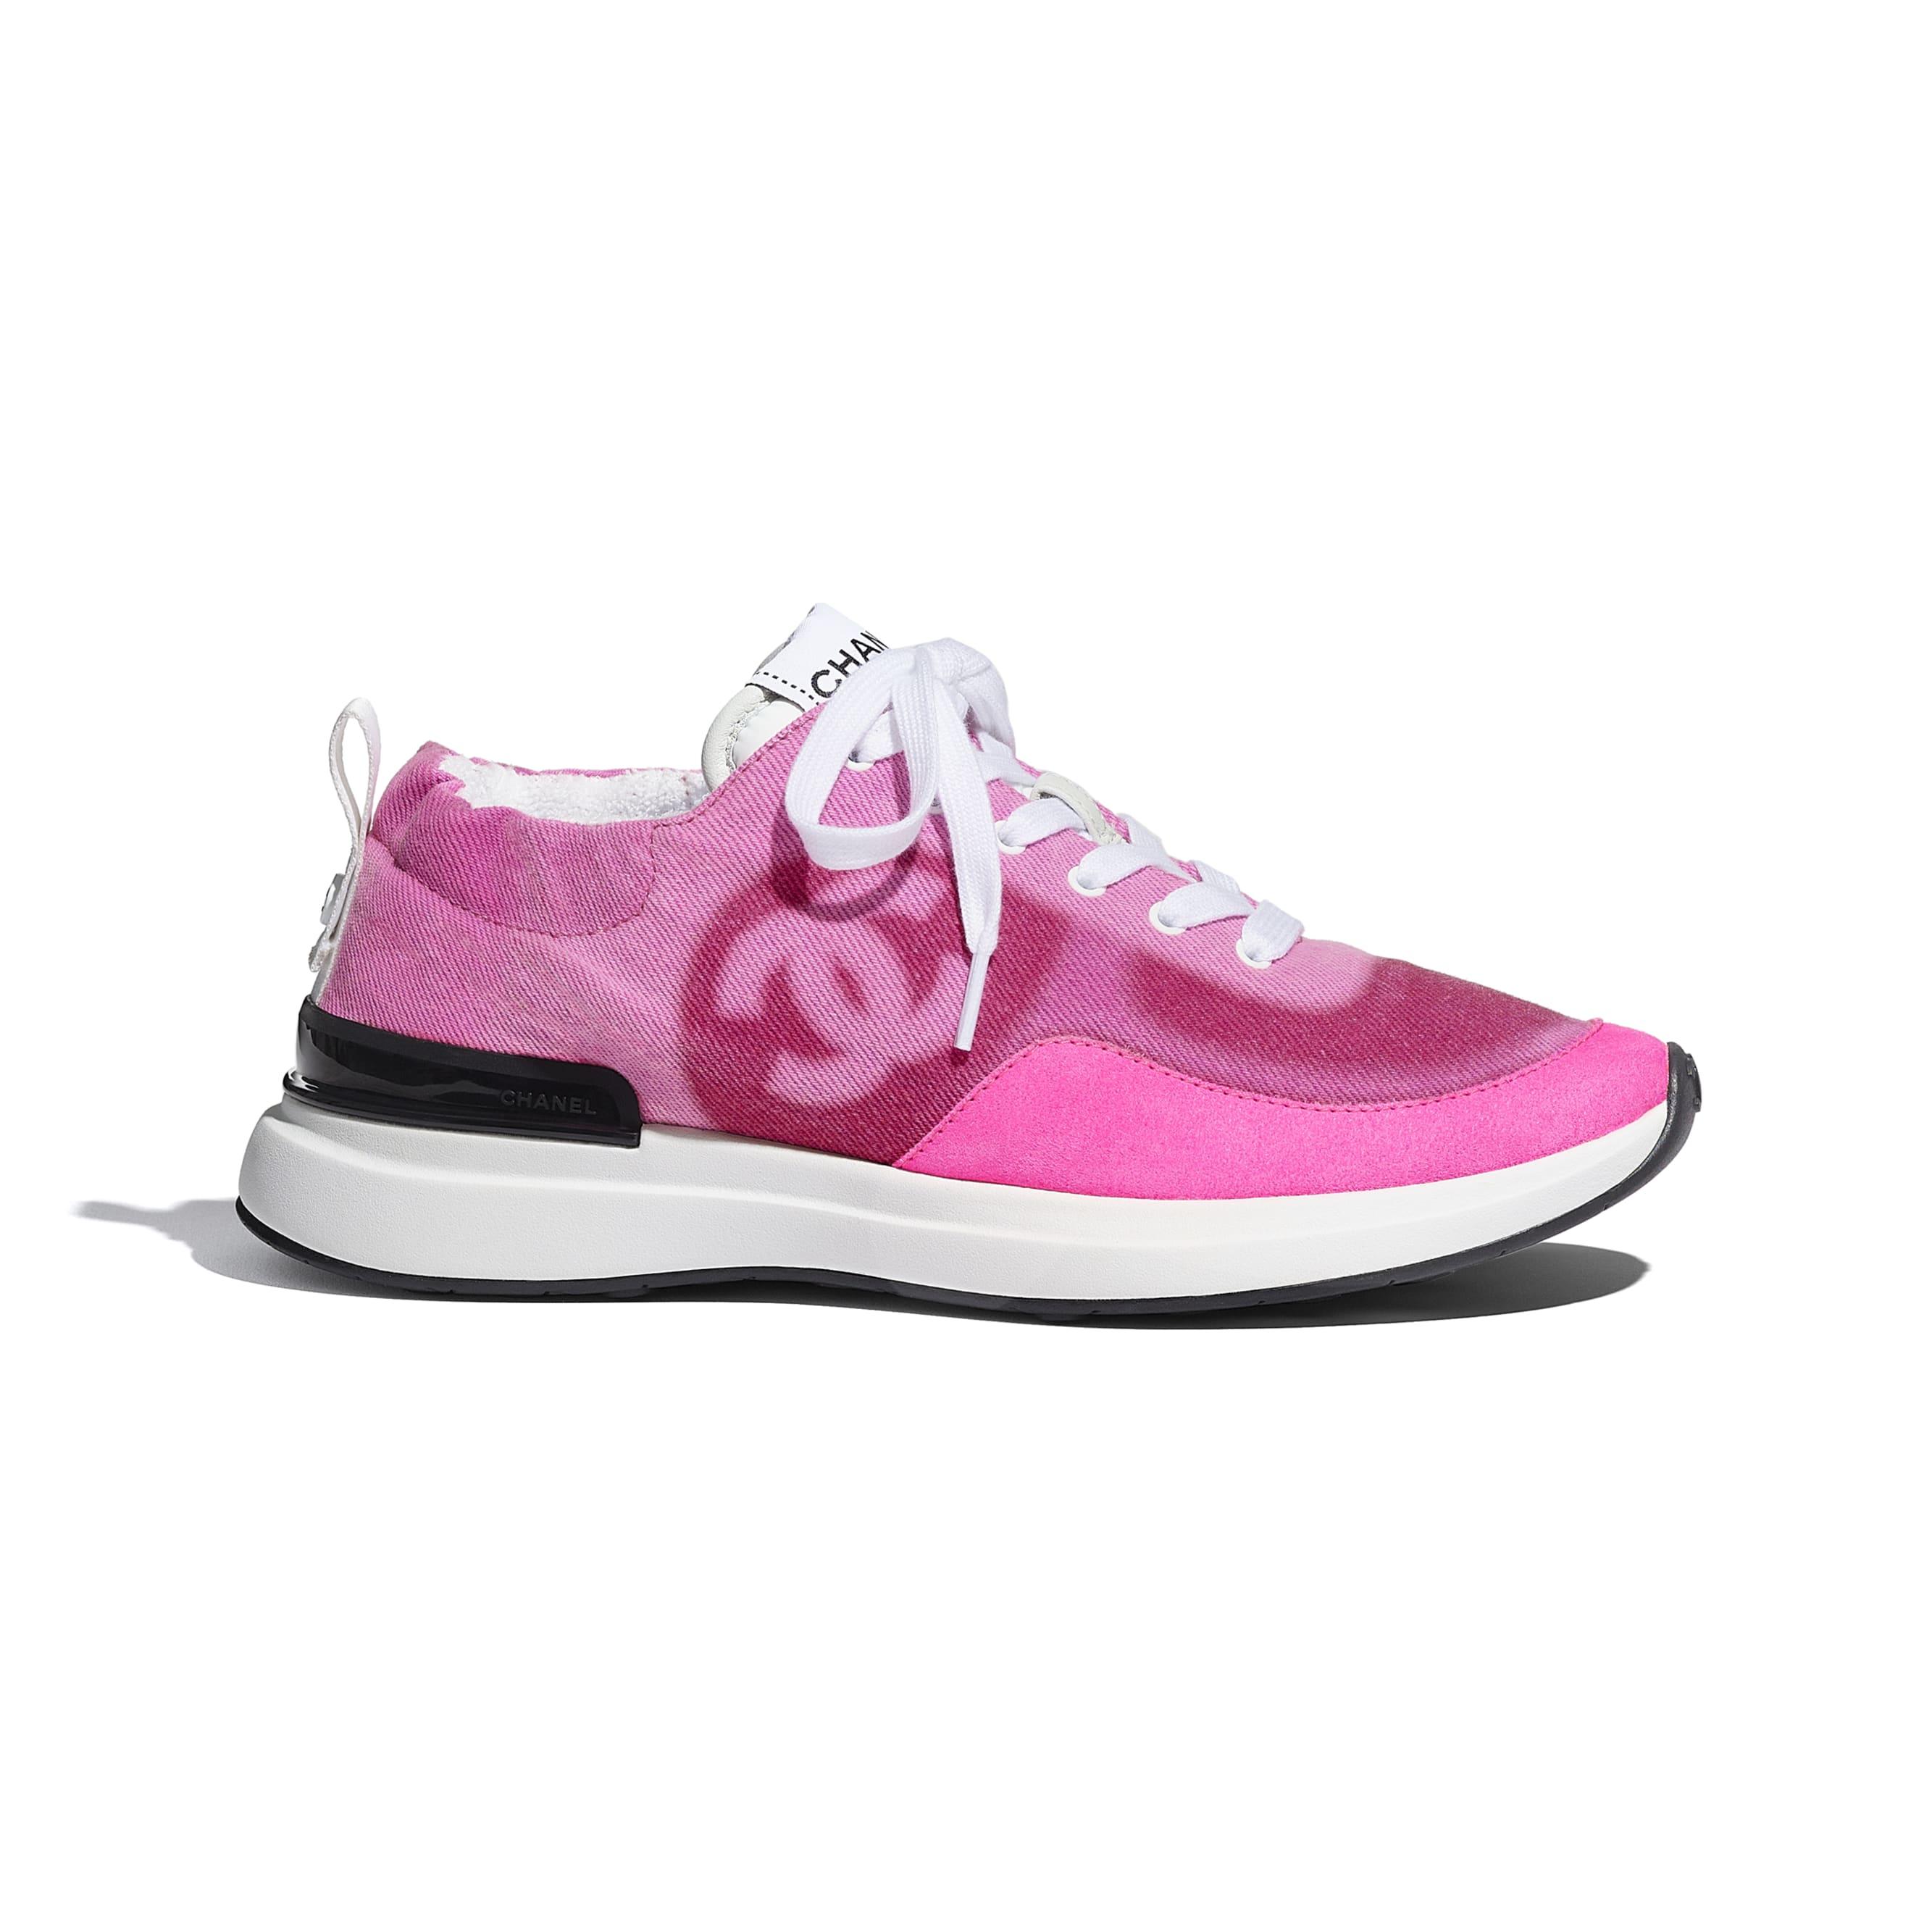 Trainers - Neon Pink - Denim & Suede Calfskin - CHANEL - Default view - see standard sized version